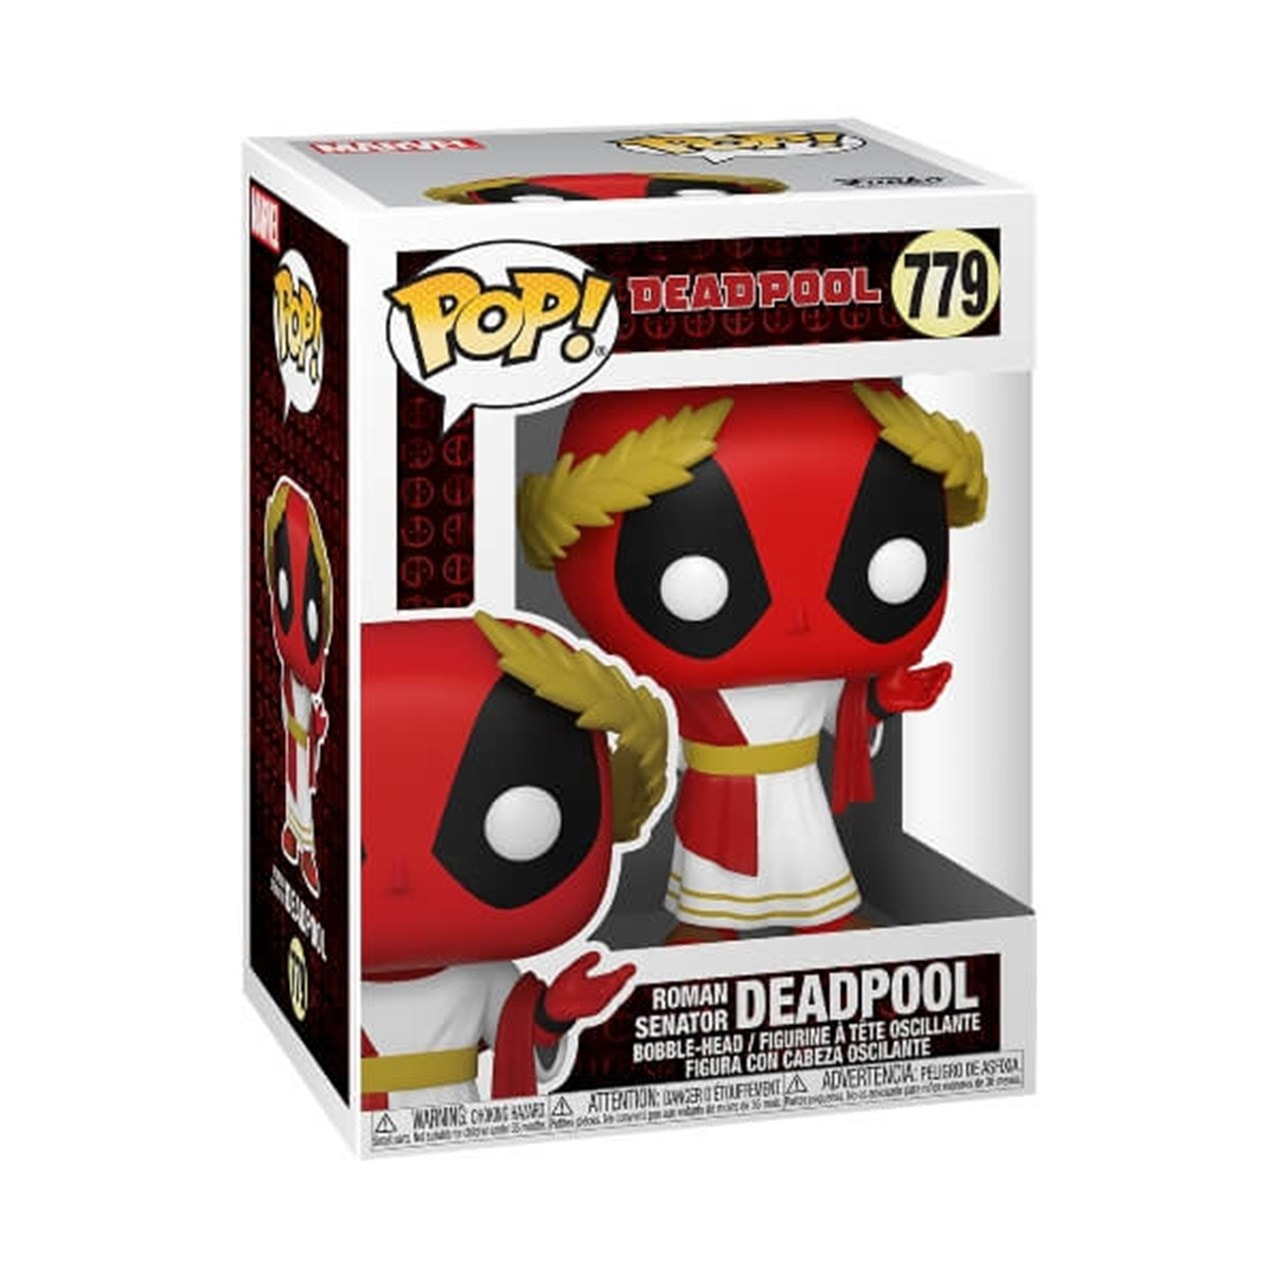 Roman Senator (779) Deadpool 30th Marvel Pop Vinyl - 2